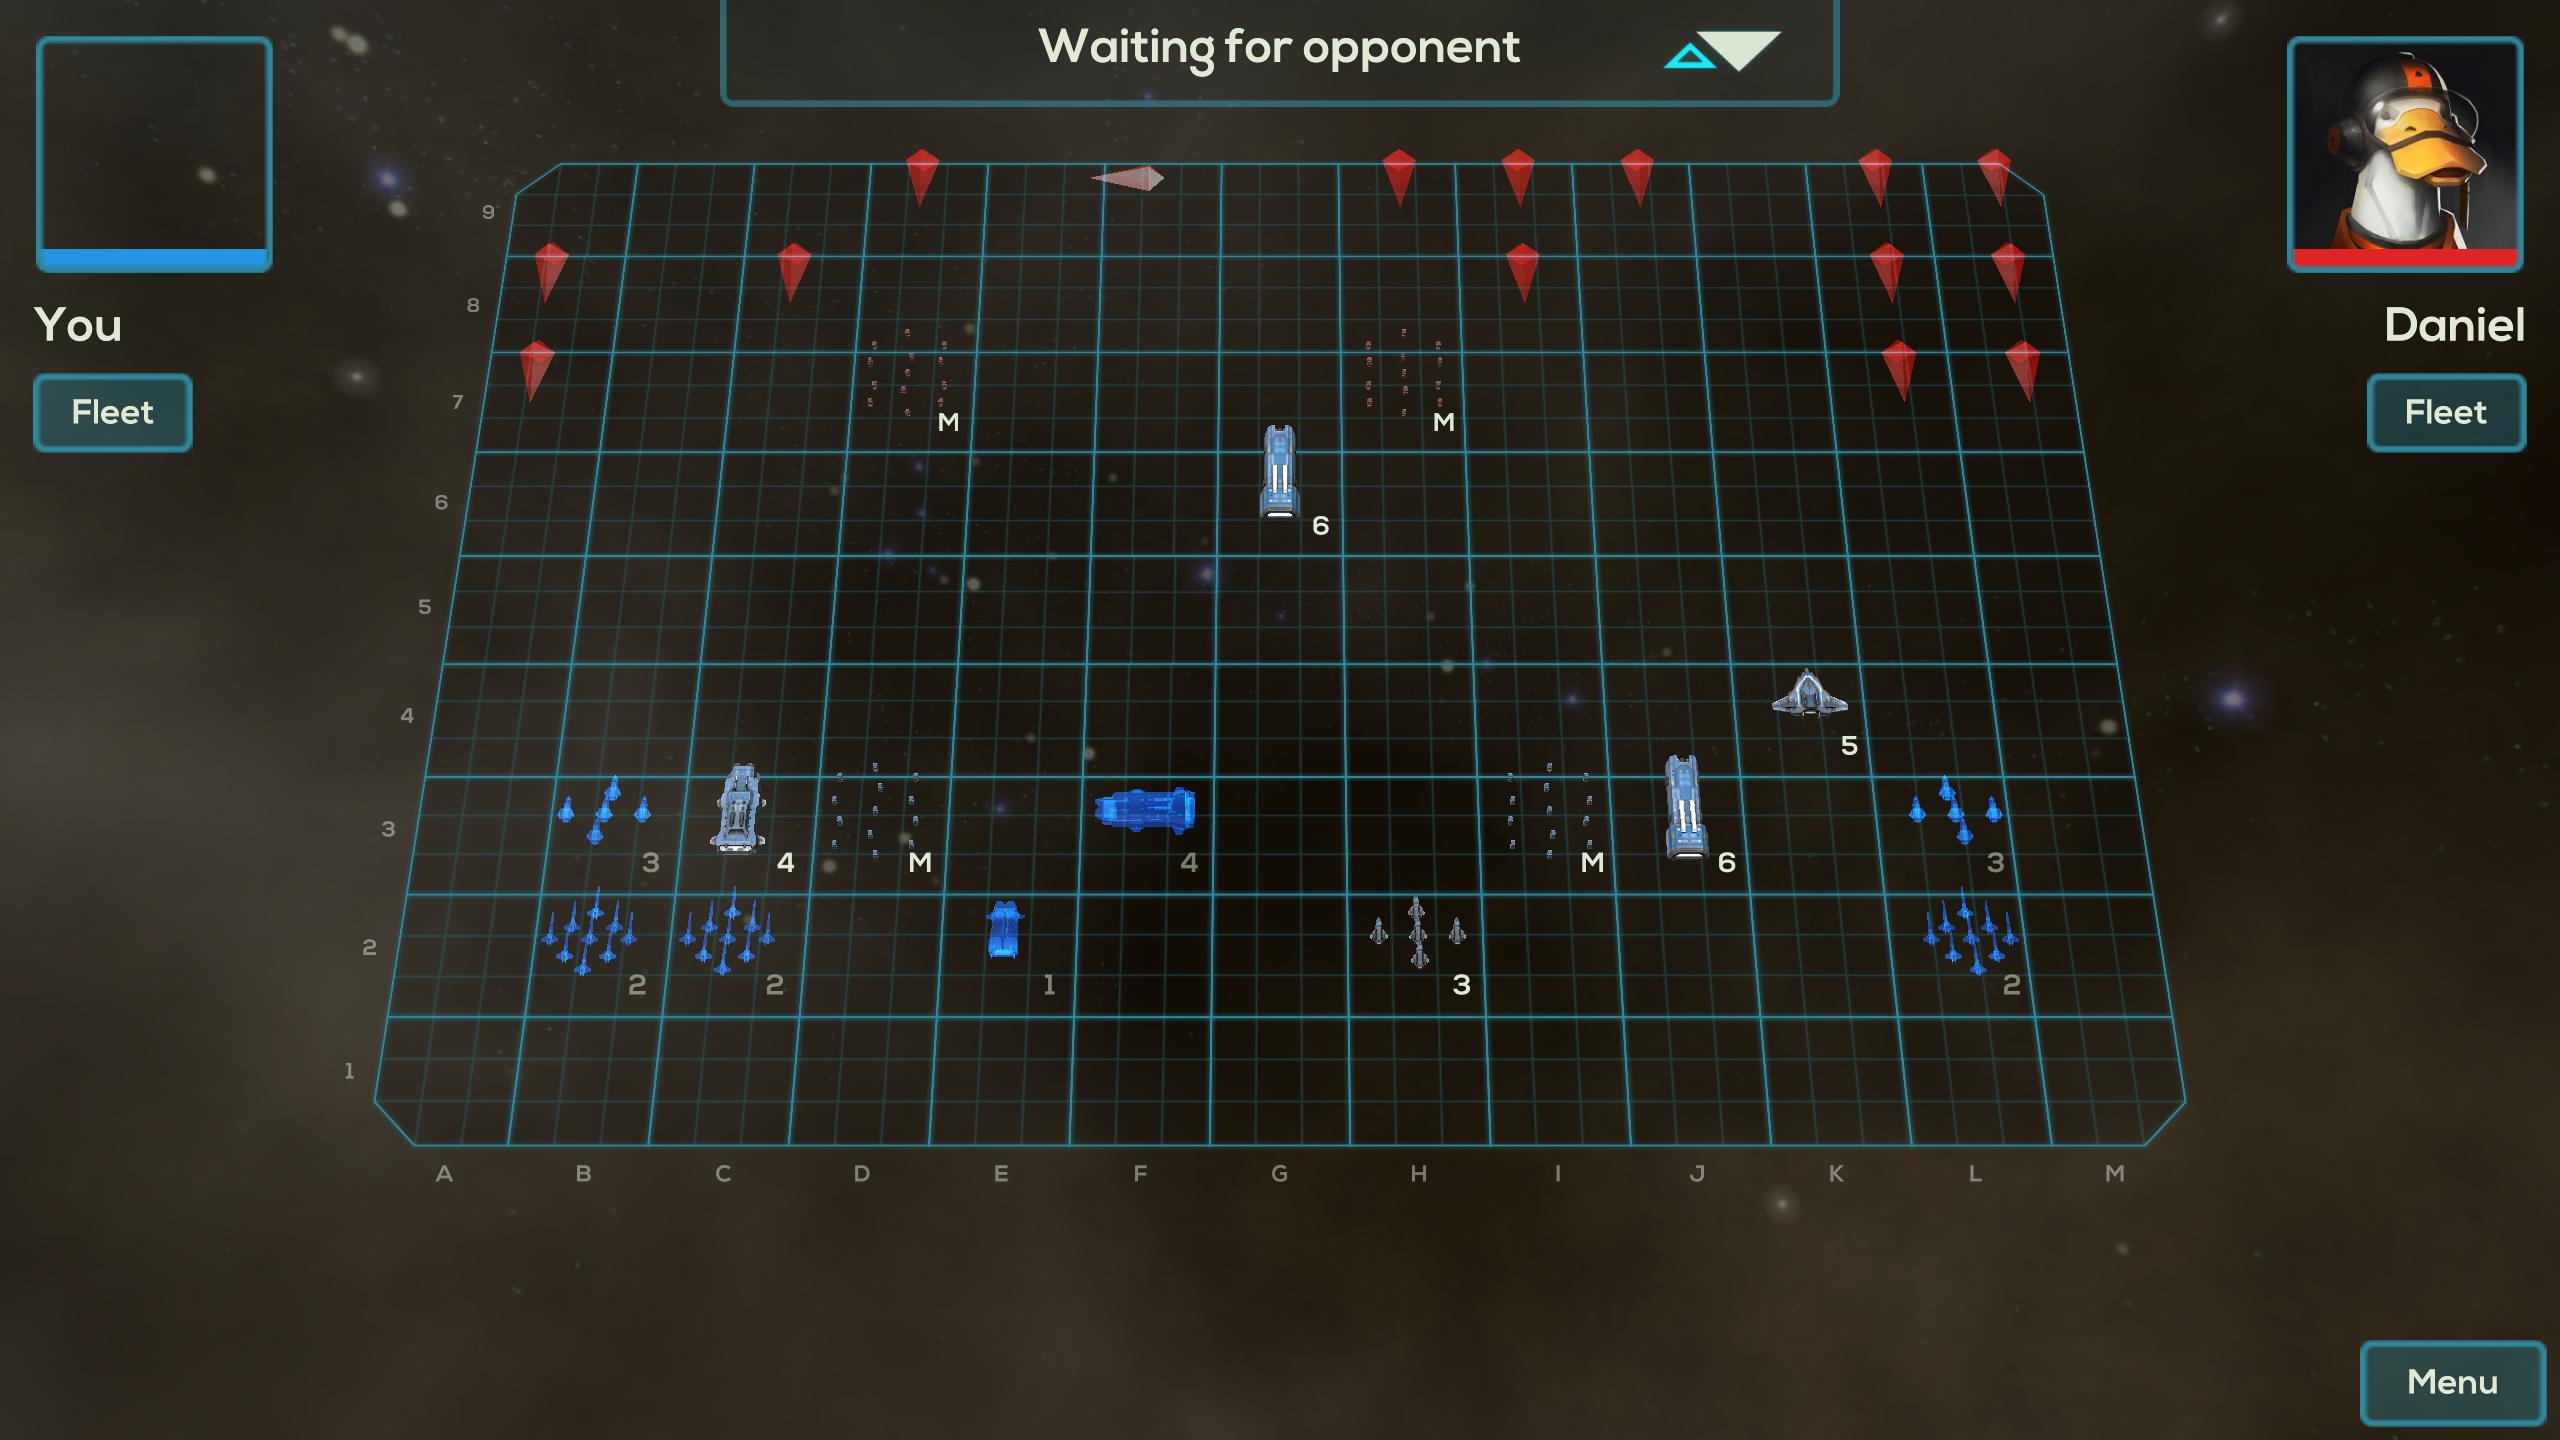 Where's that command ship hiding?